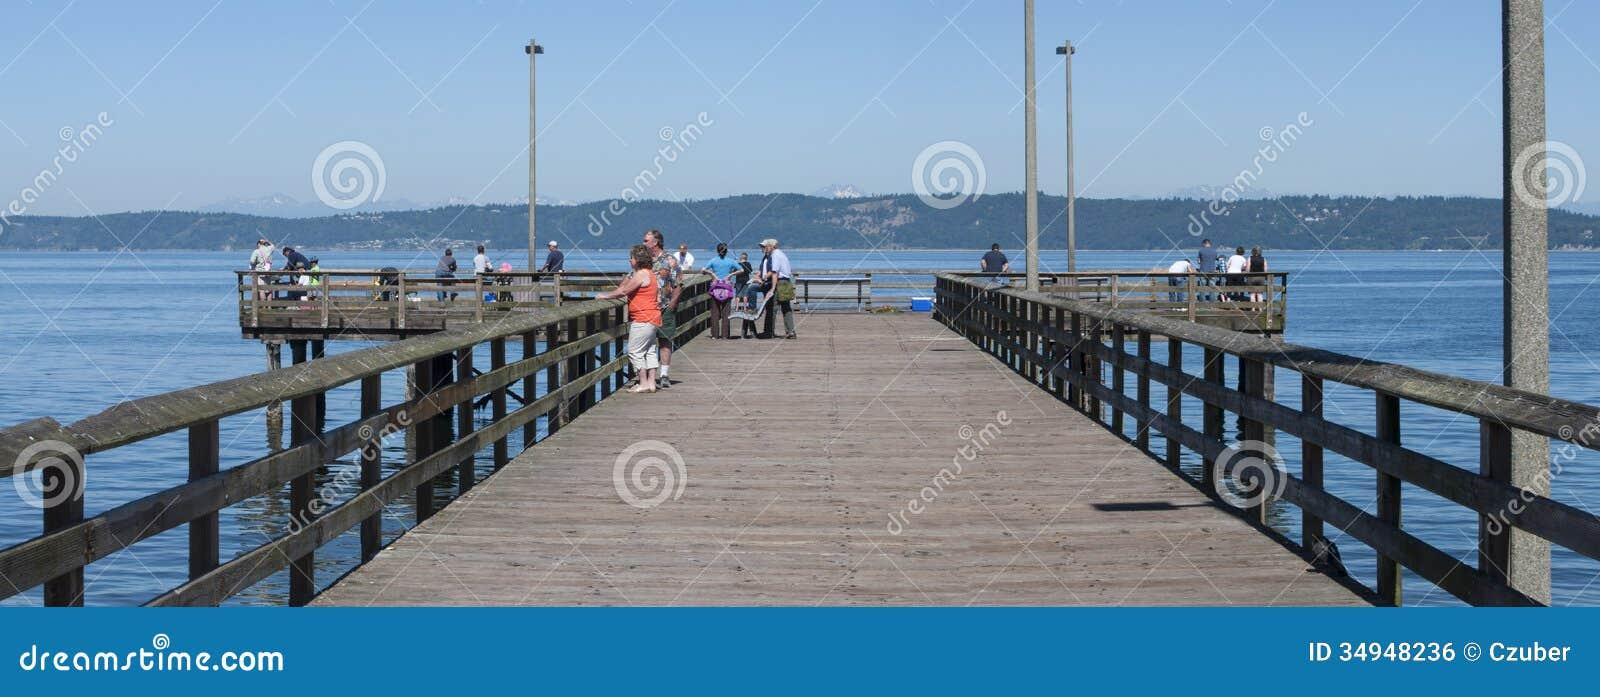 Redondo beach pier editorial photo image 34948236 for Redondo beach pier fishing